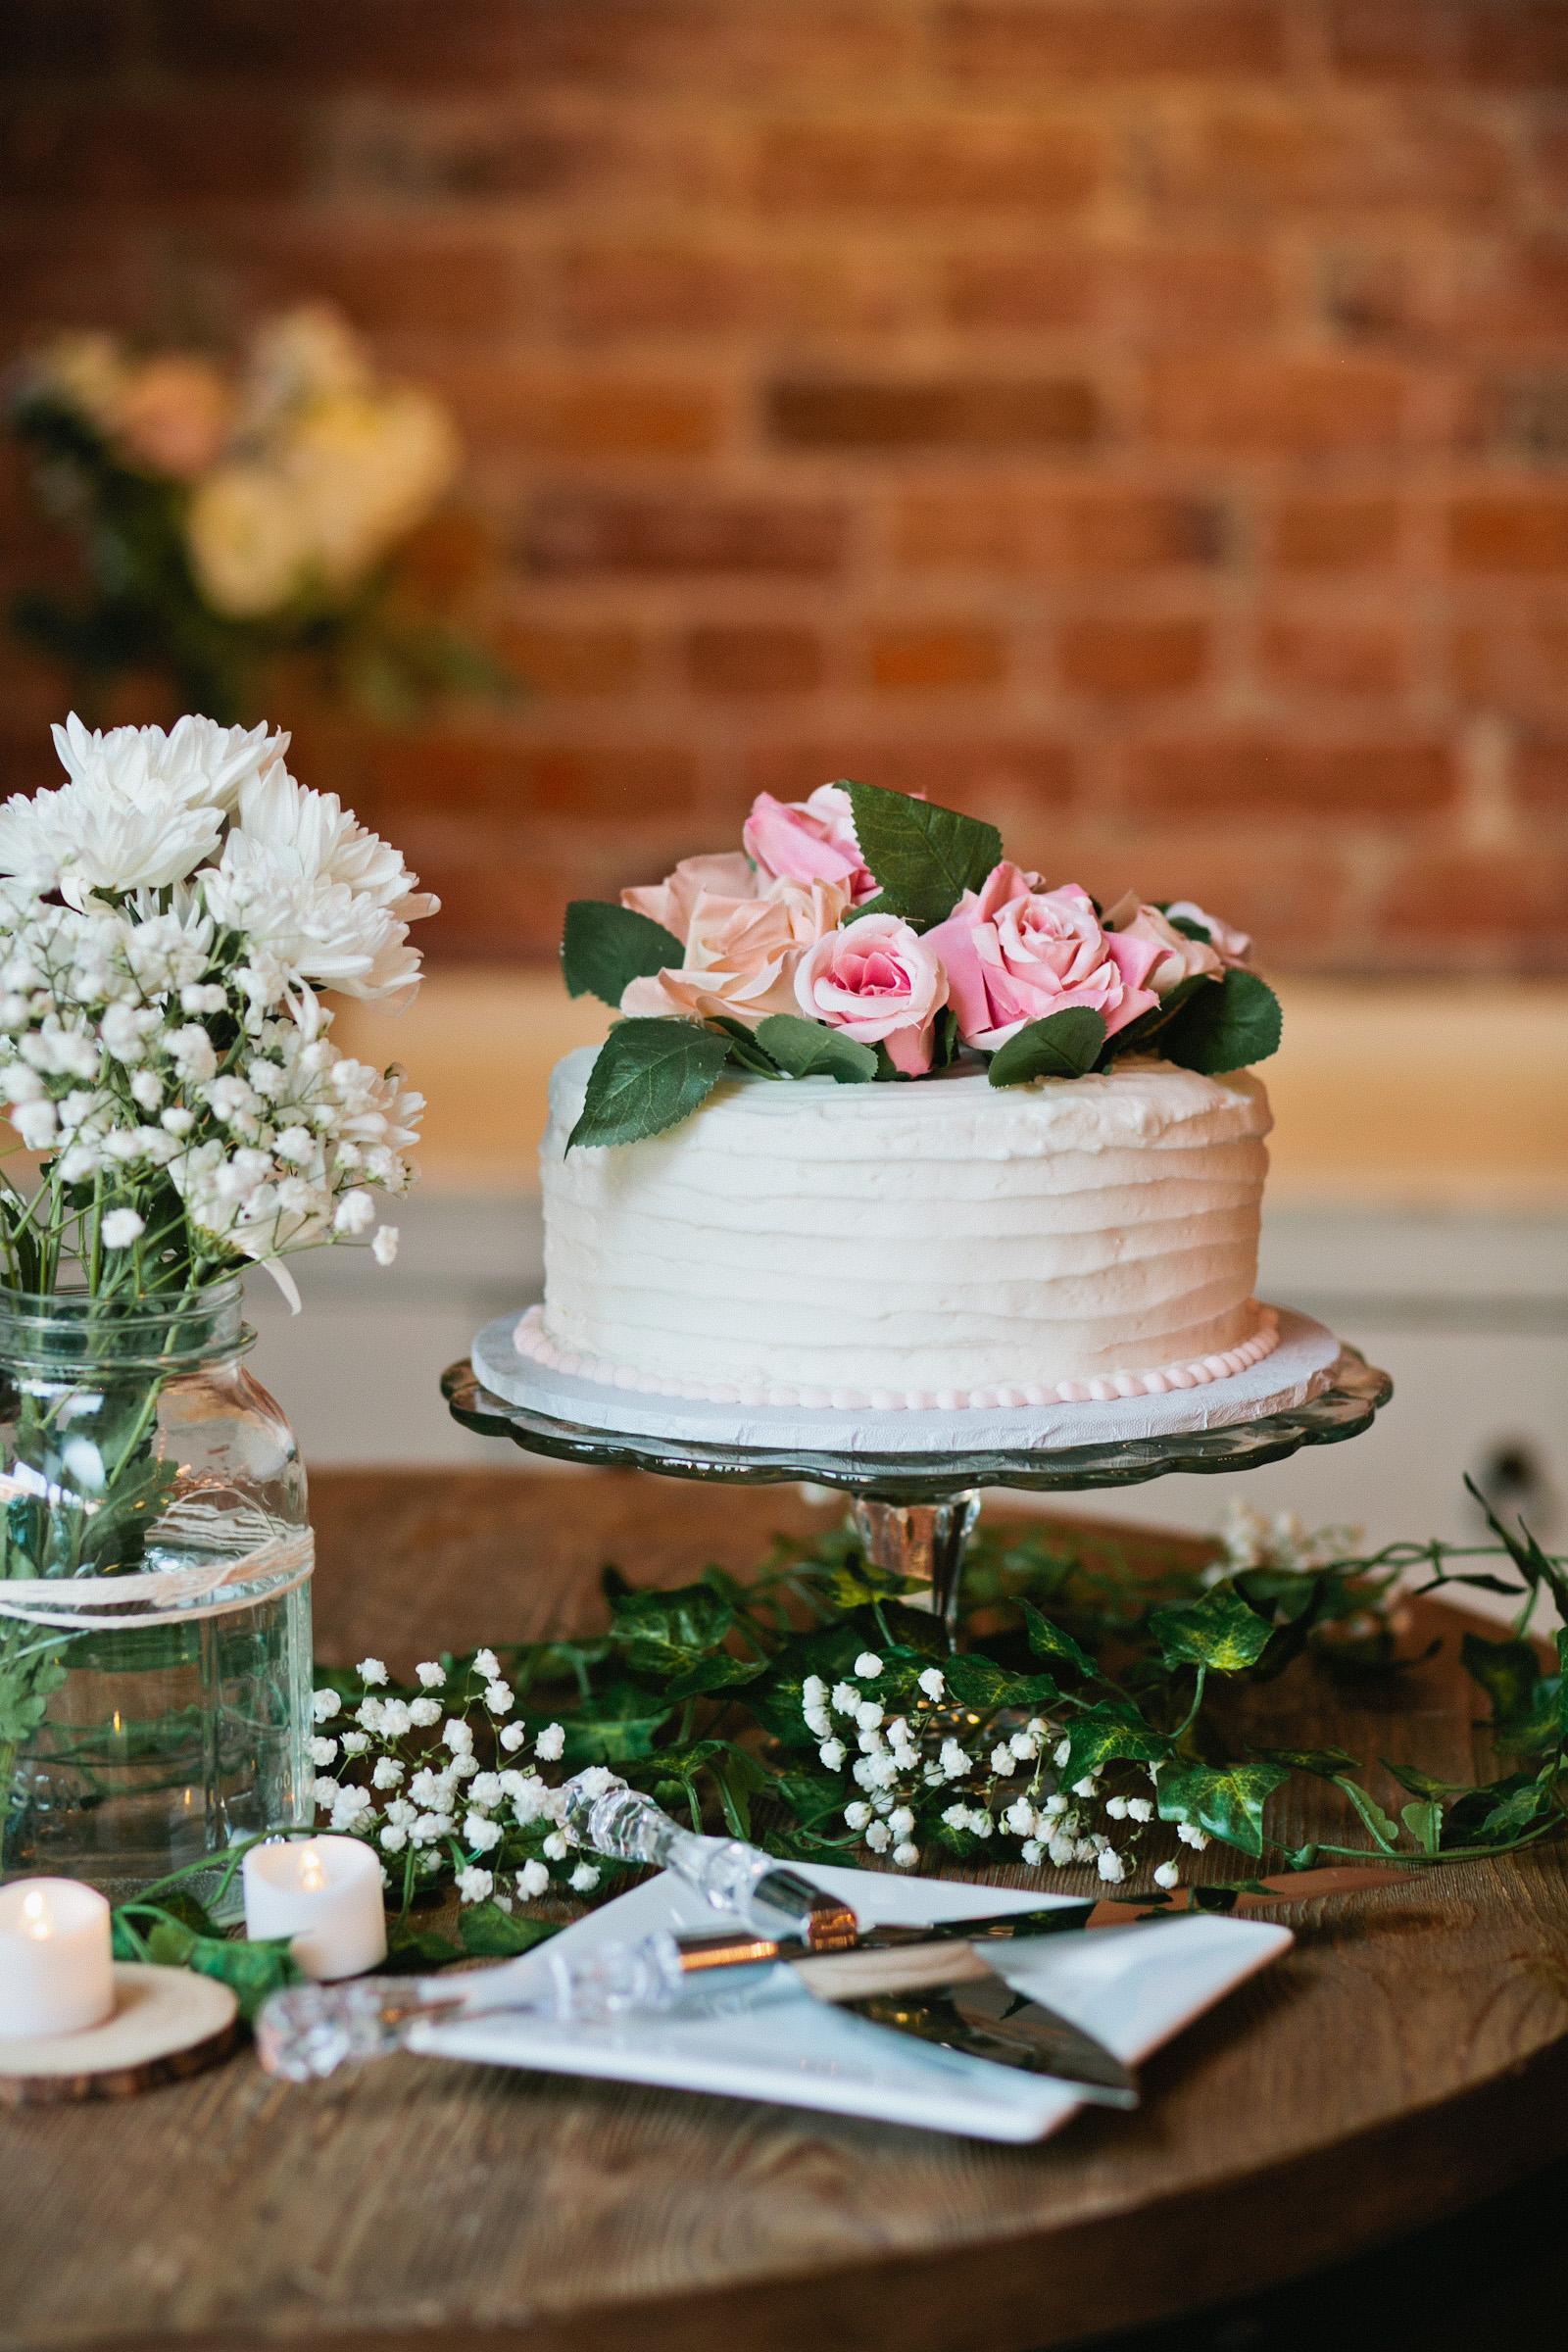 dutch-oven-bakery-wedding-cake